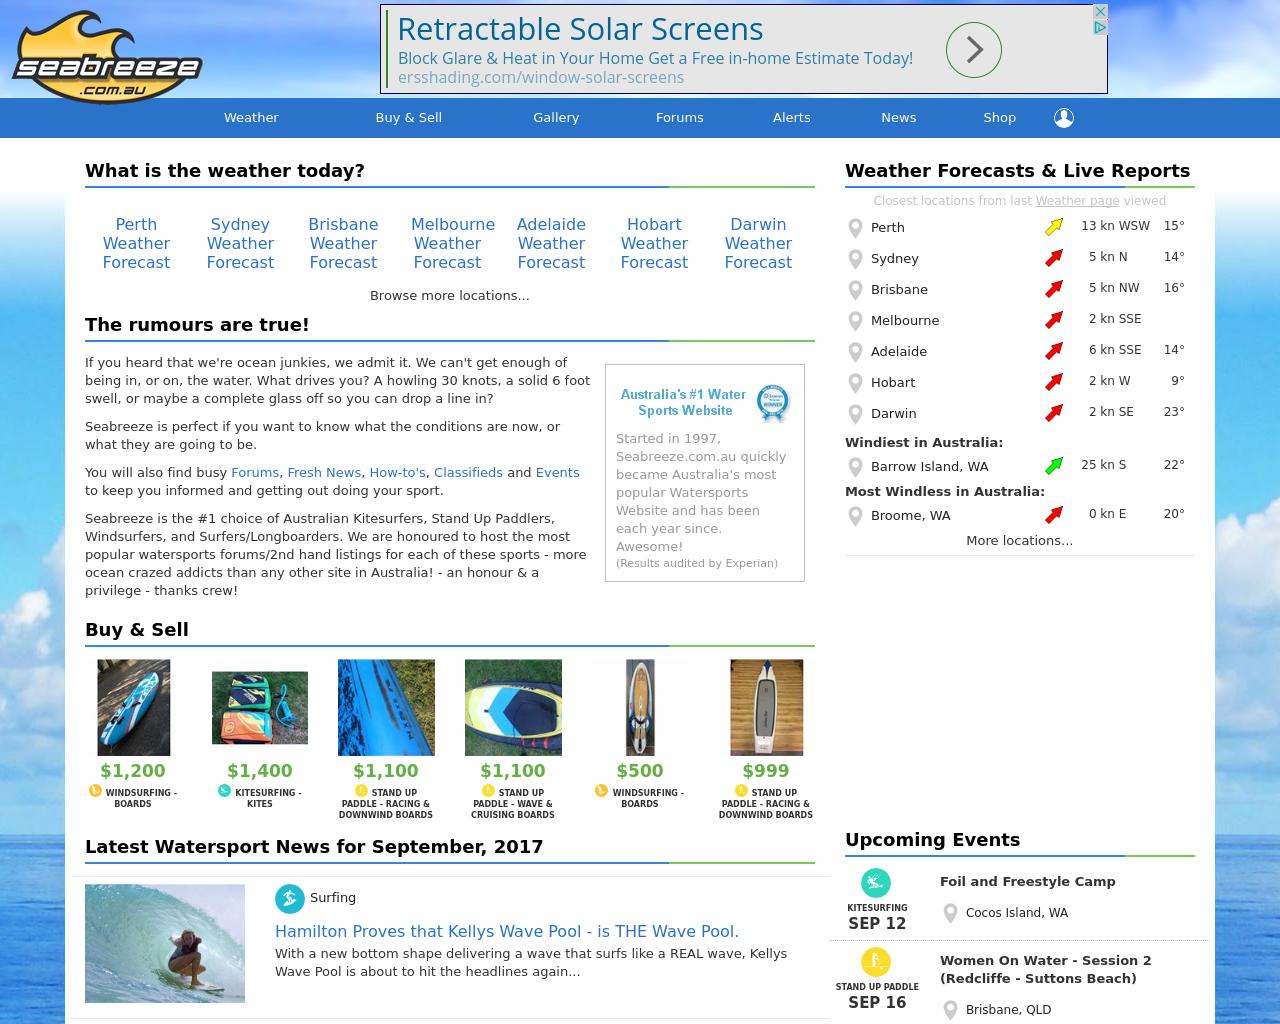 seabreeze.com-Advertising-Reviews-Pricing